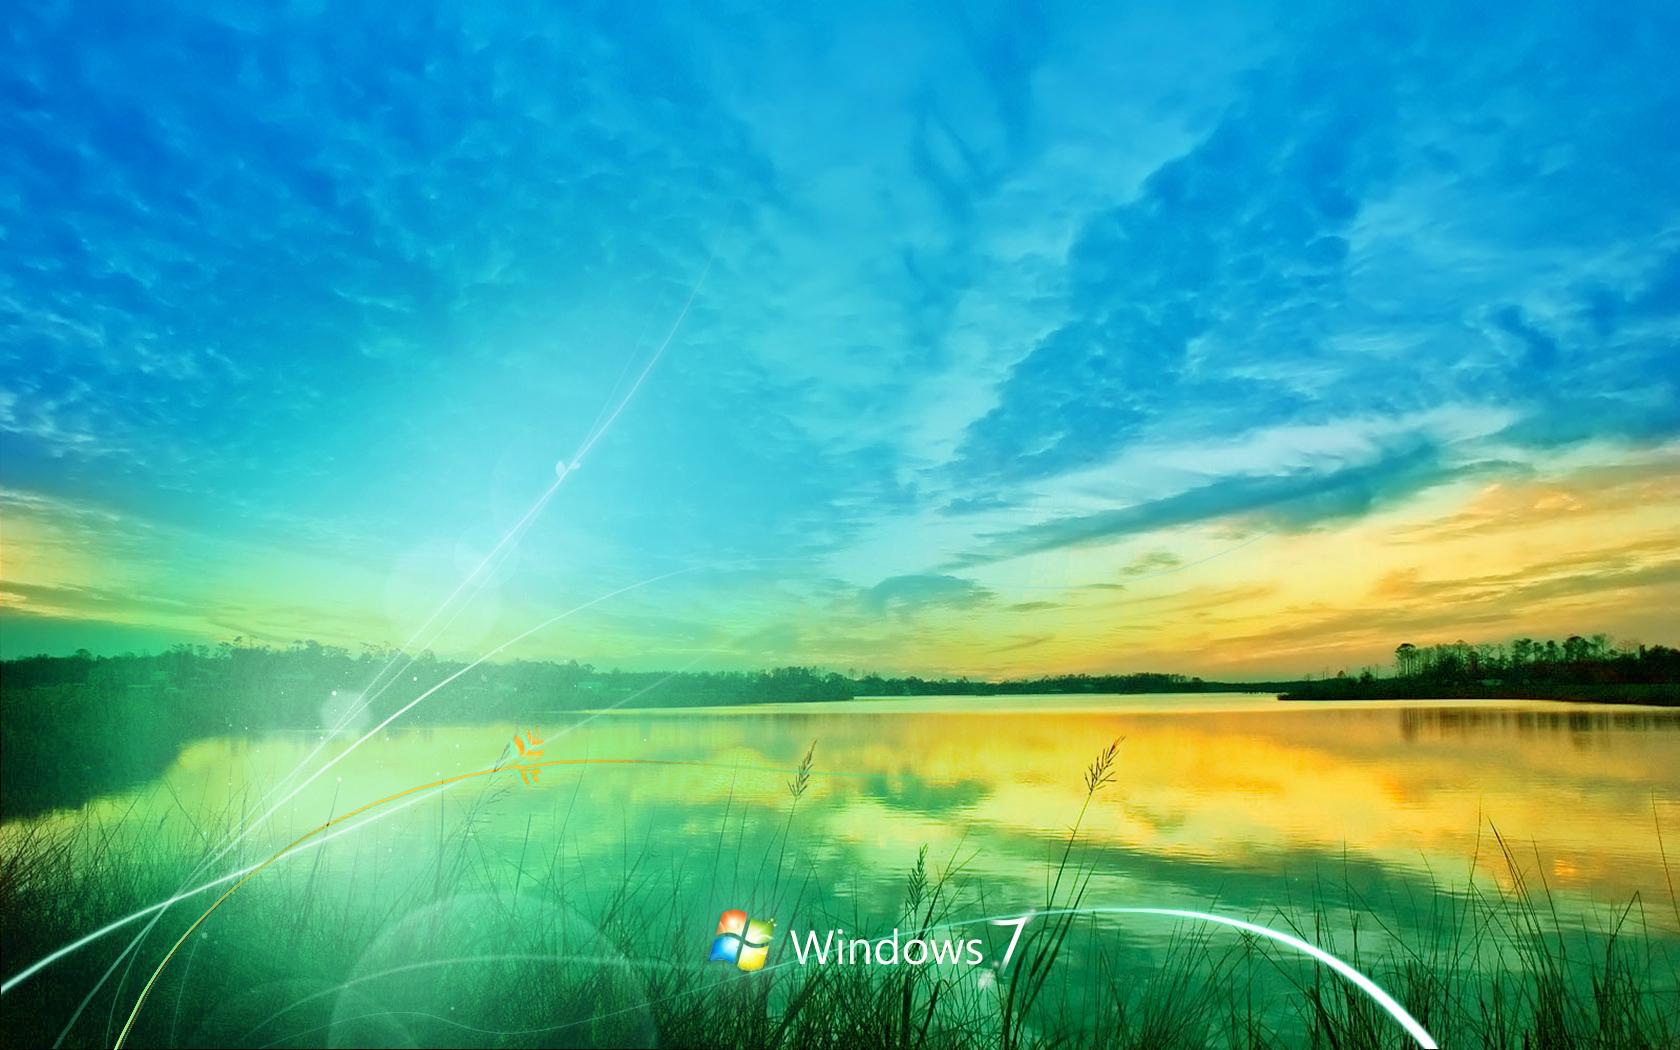 Desktop PC Wallpapers Windows 7 Seven Wallpaper Set 14